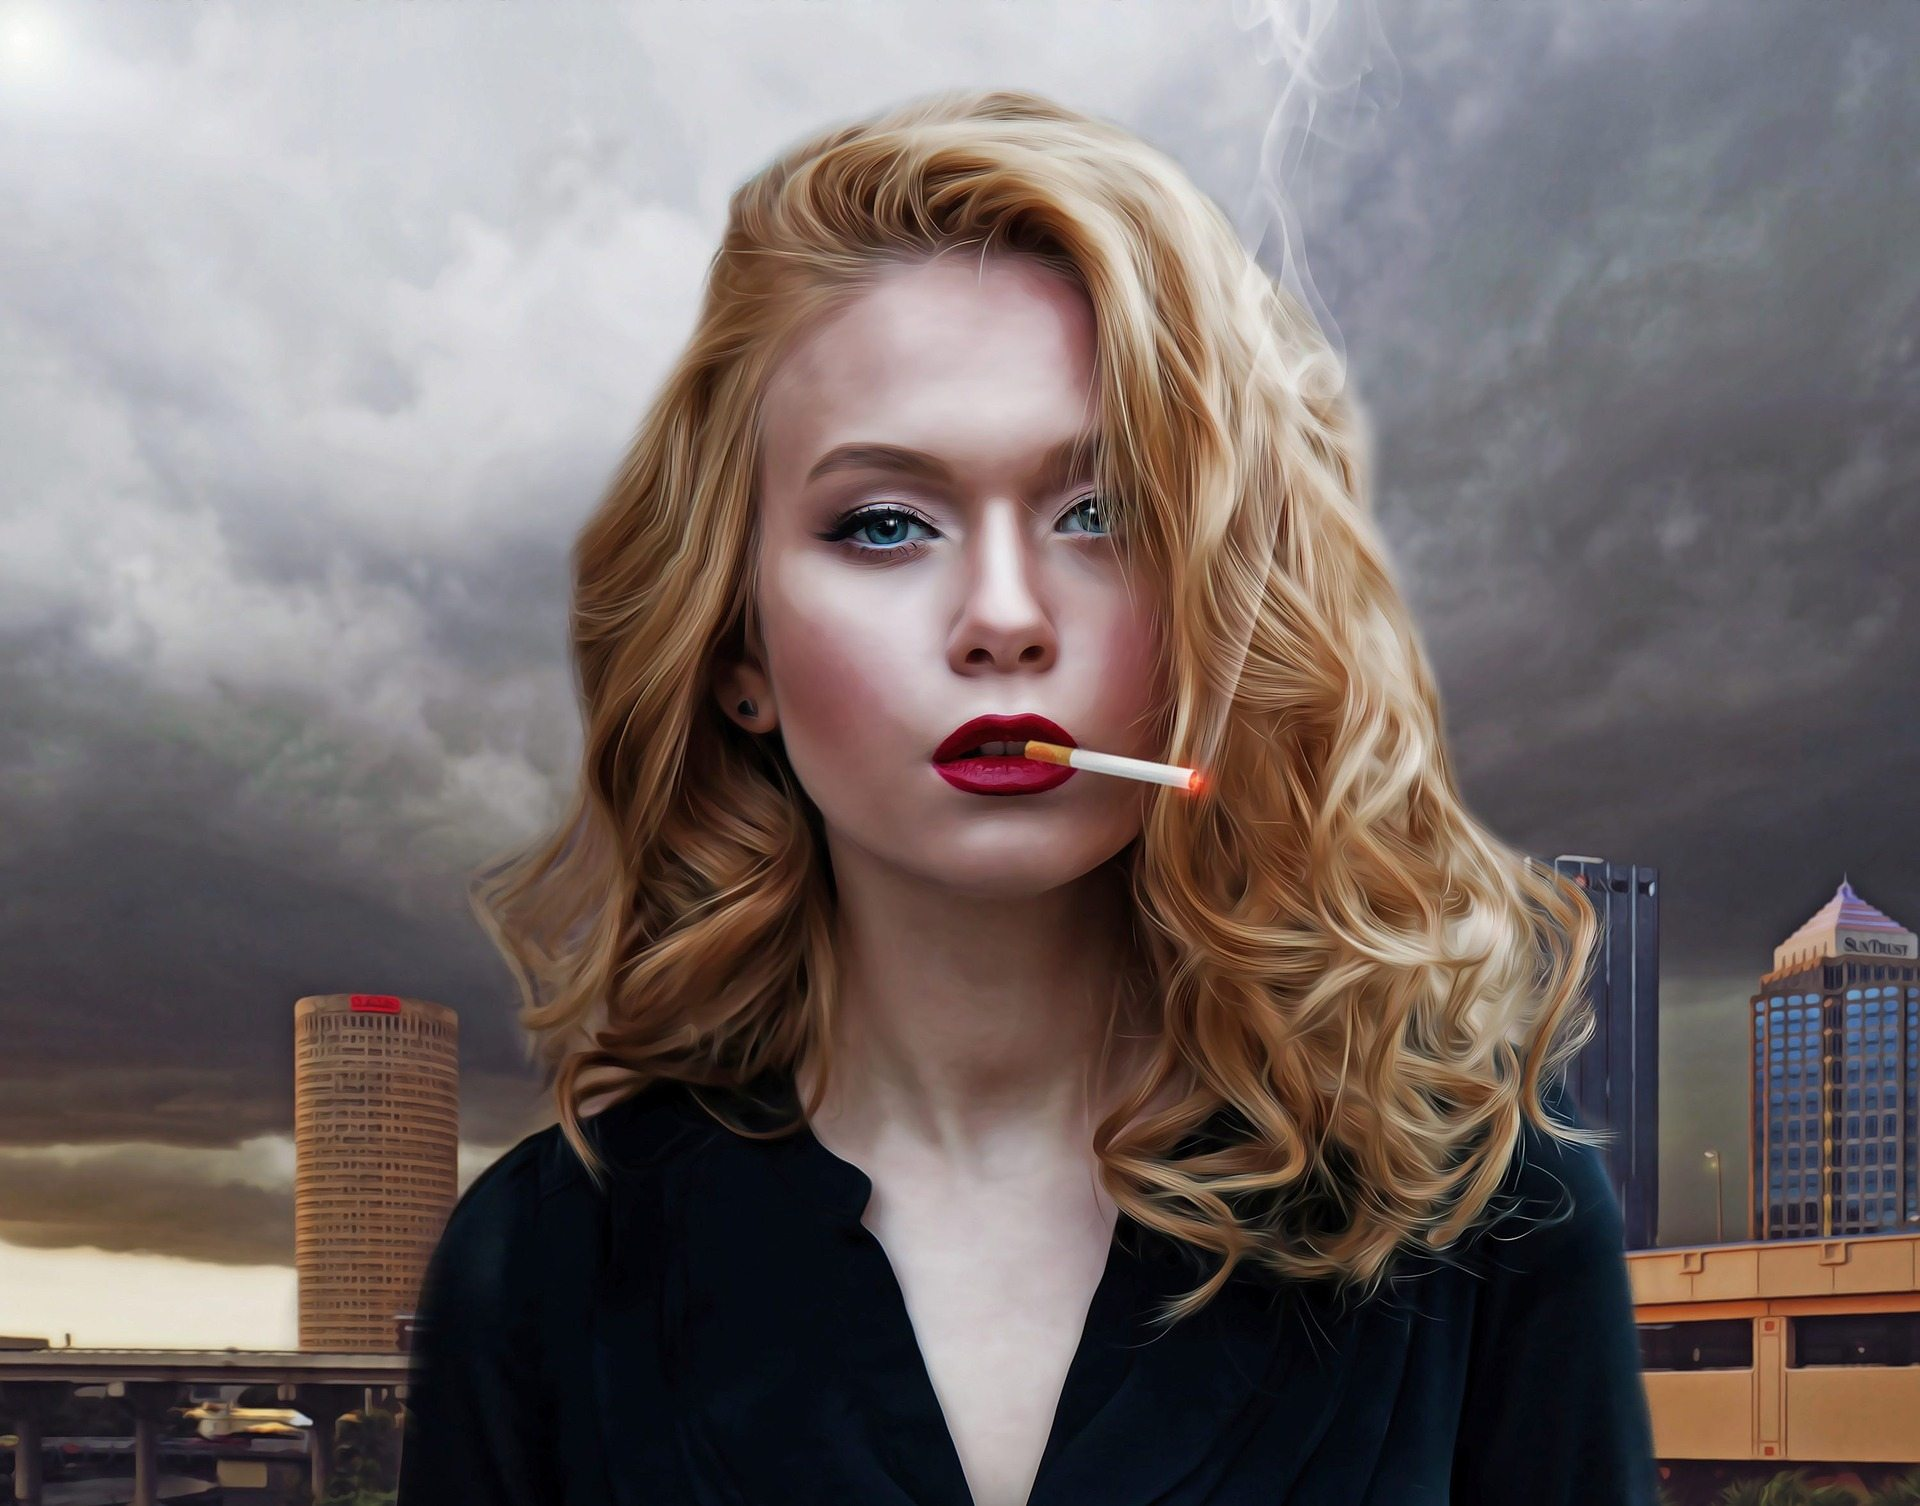 sieviete-cigarette